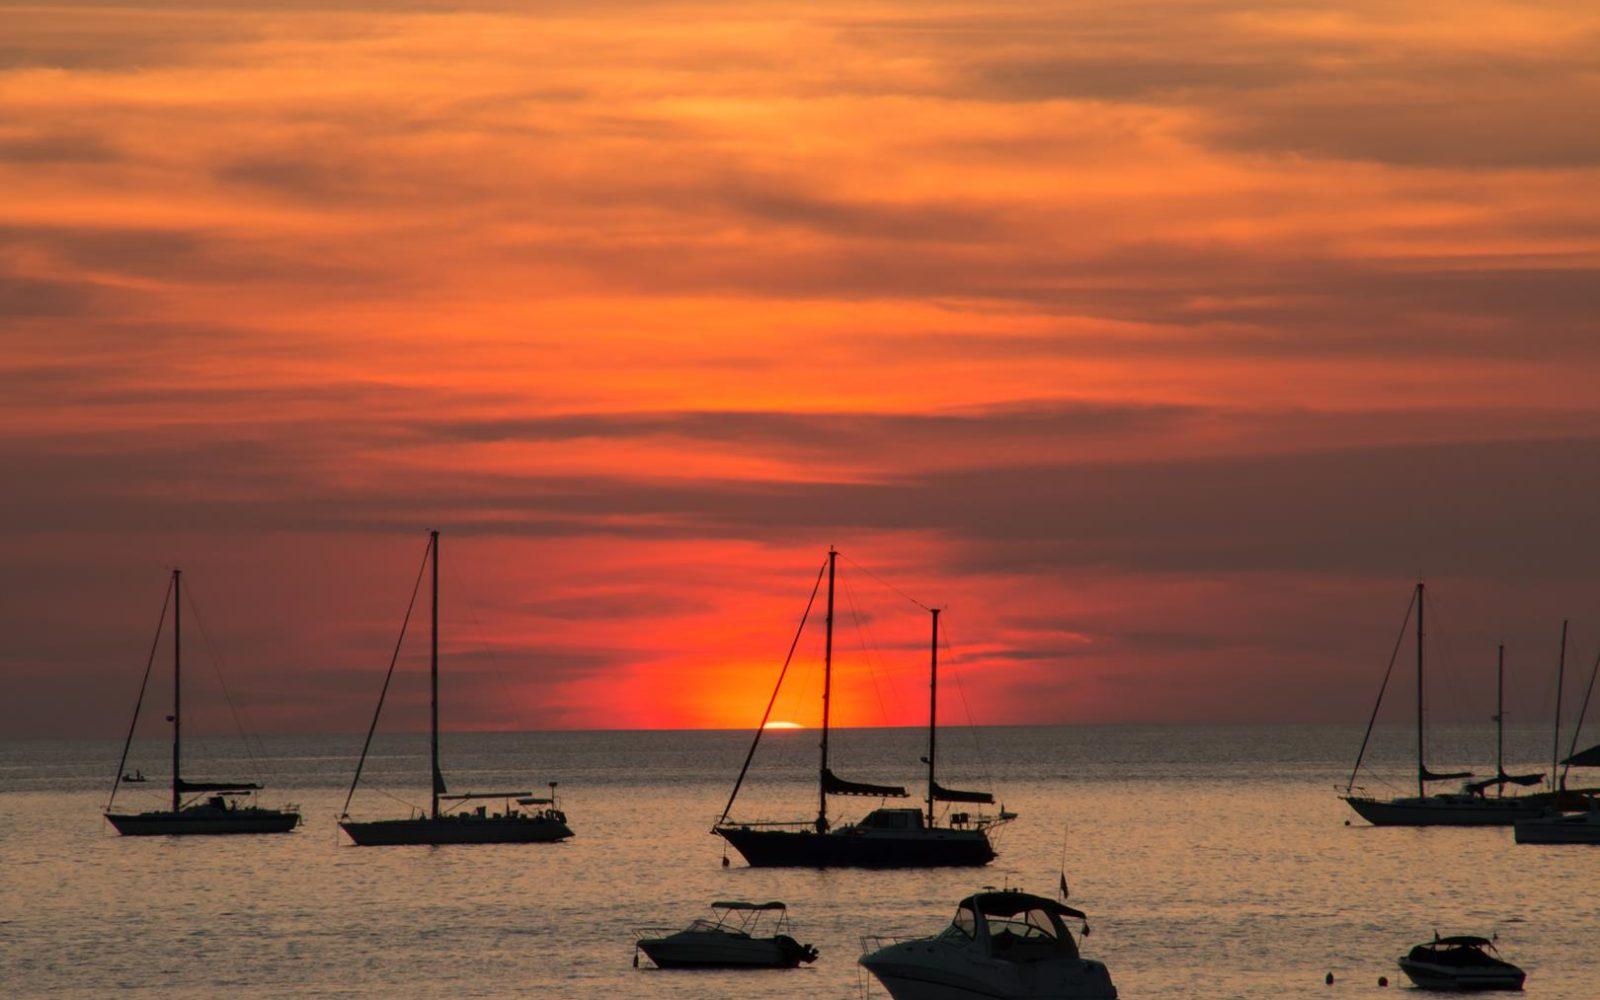 Phuket's famous Nai Harn Beach during Sunset